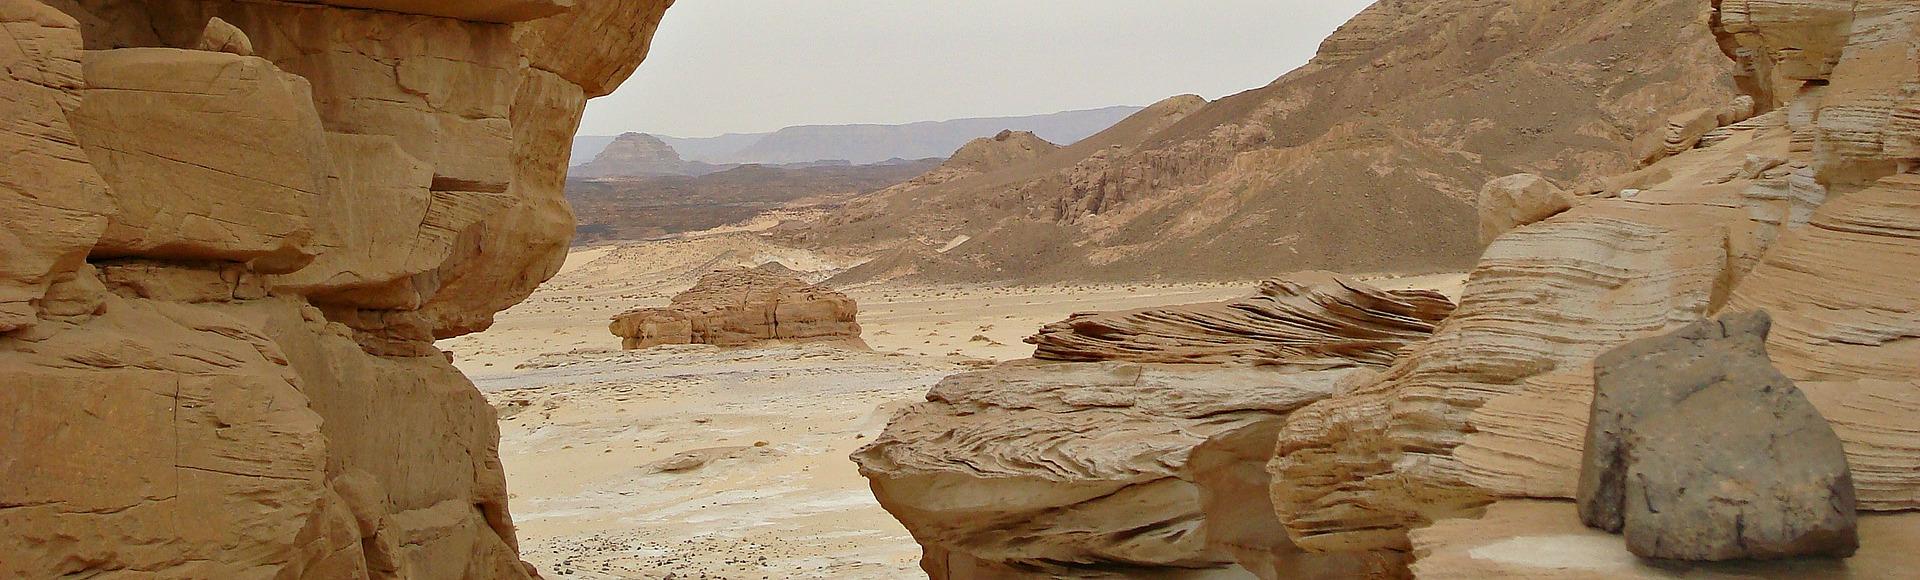 sinaiwoestijn desertjoy